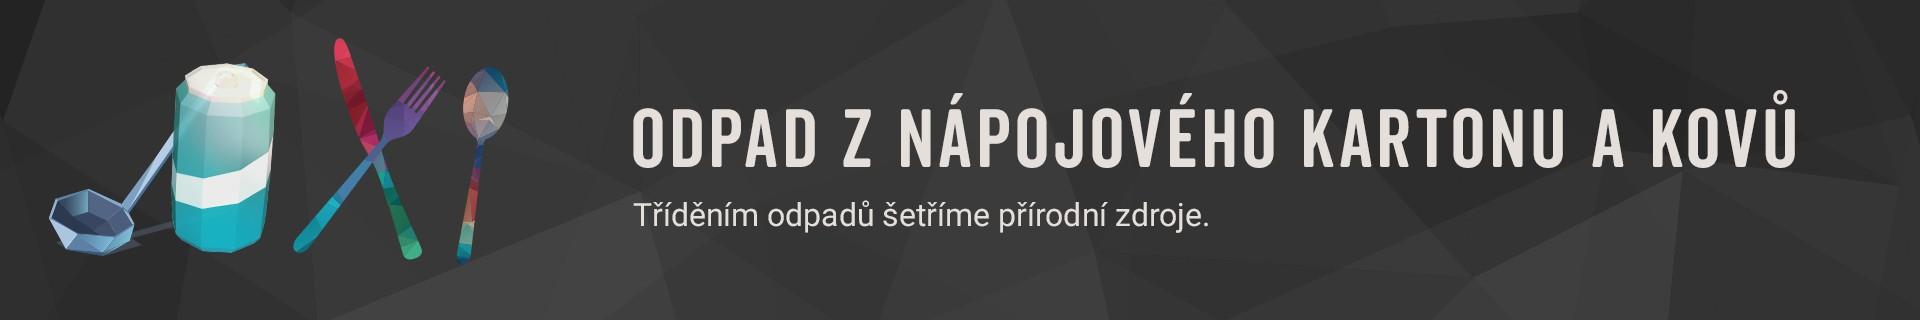 odpad_trideni_kov_napojovy_karton